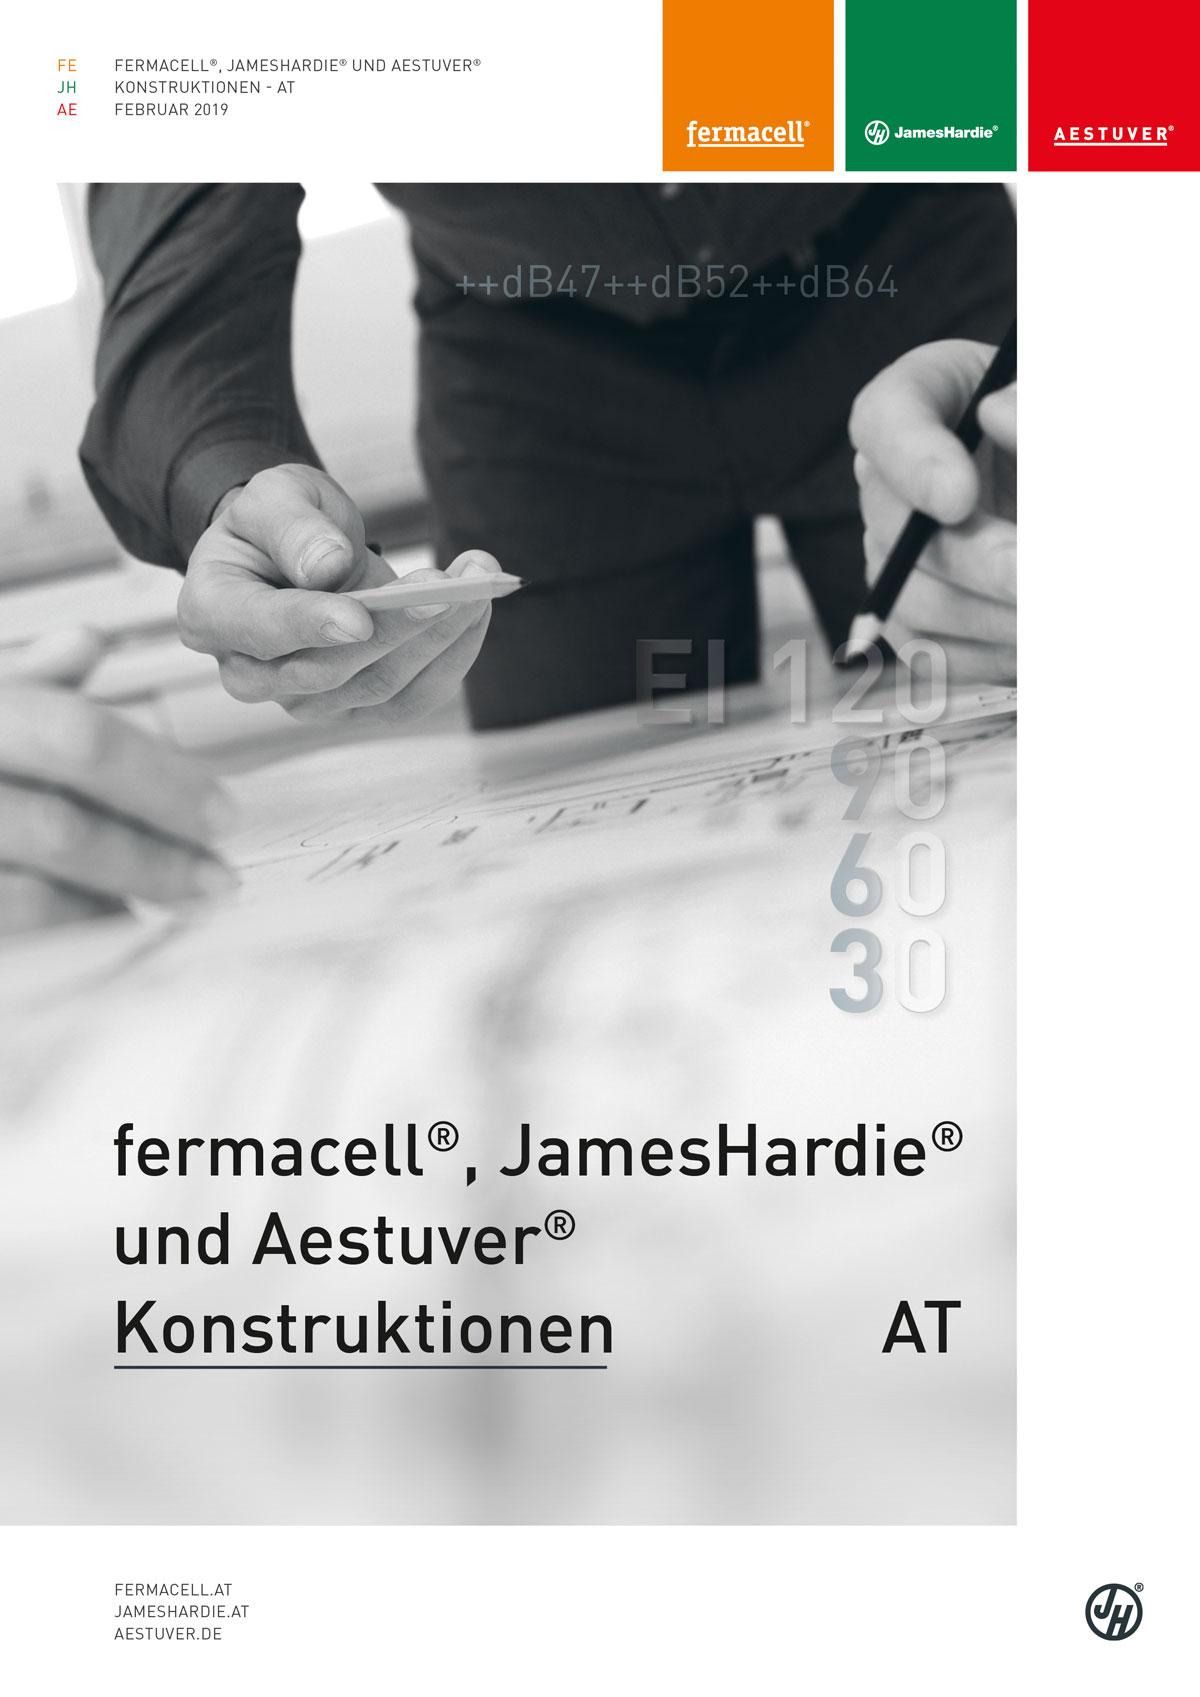 fermacell® Konstruktionsübersicht